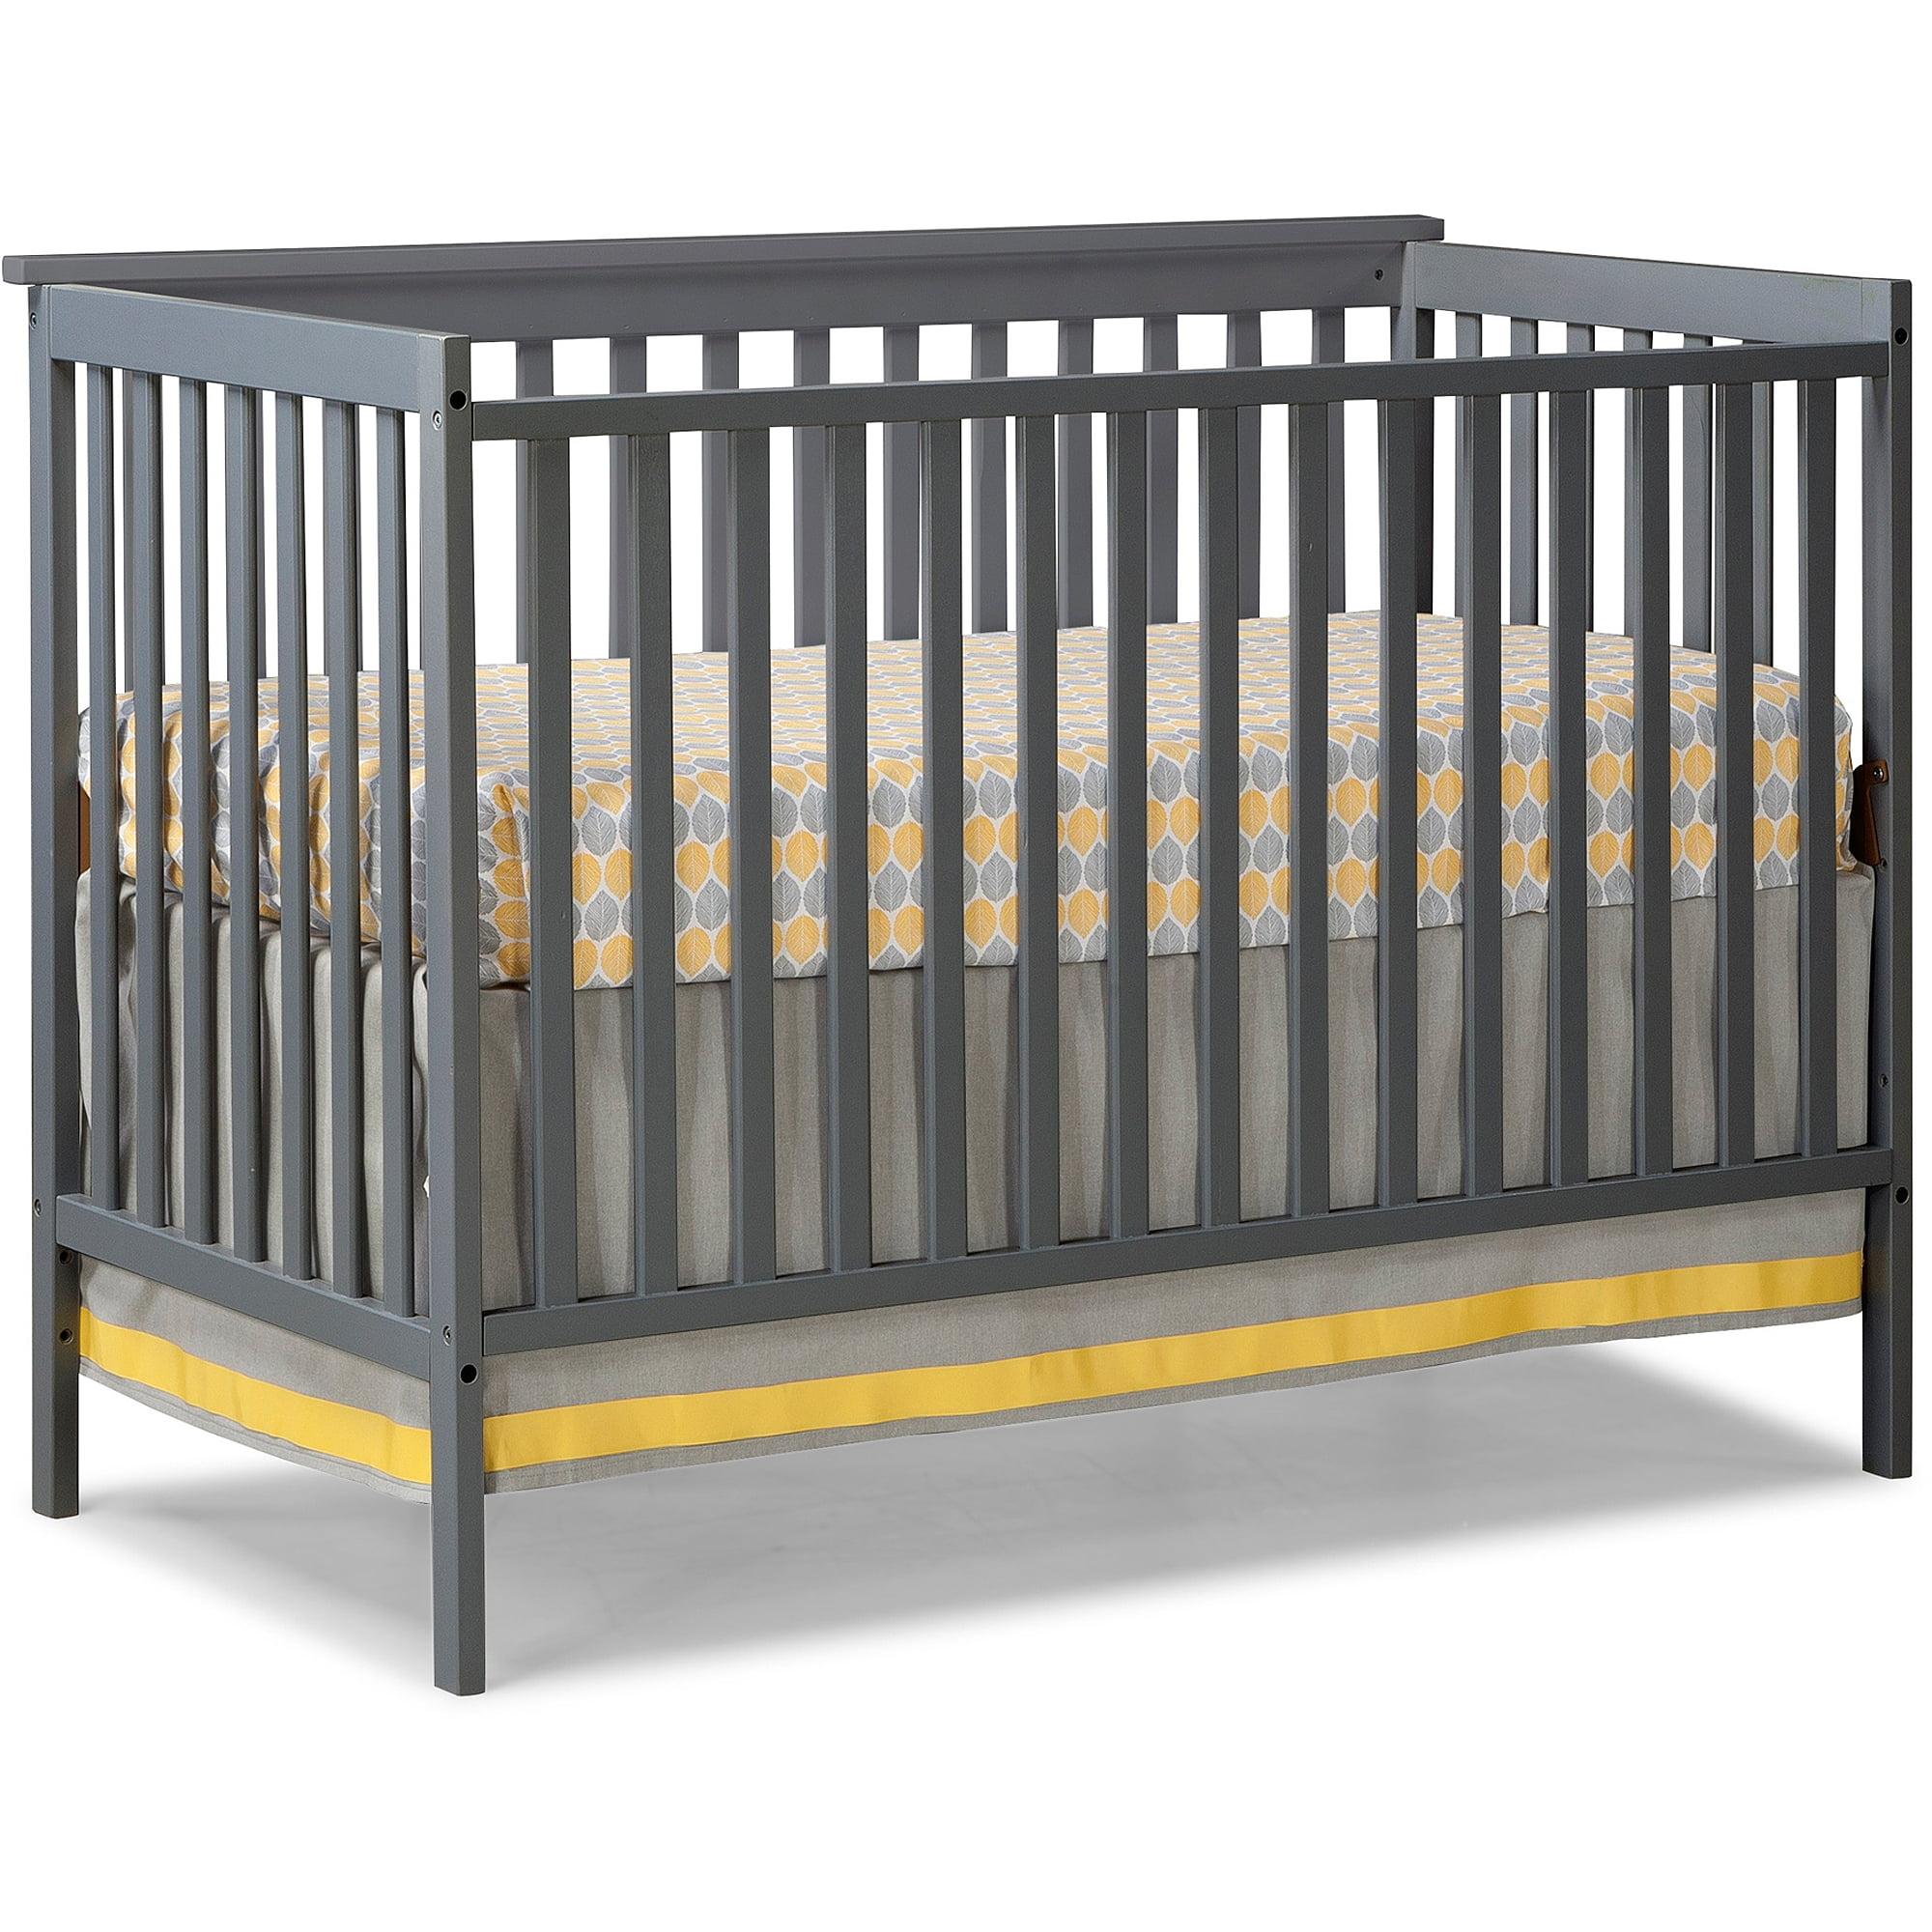 Stork craft crib reviews - Stork Craft Crib Reviews 14